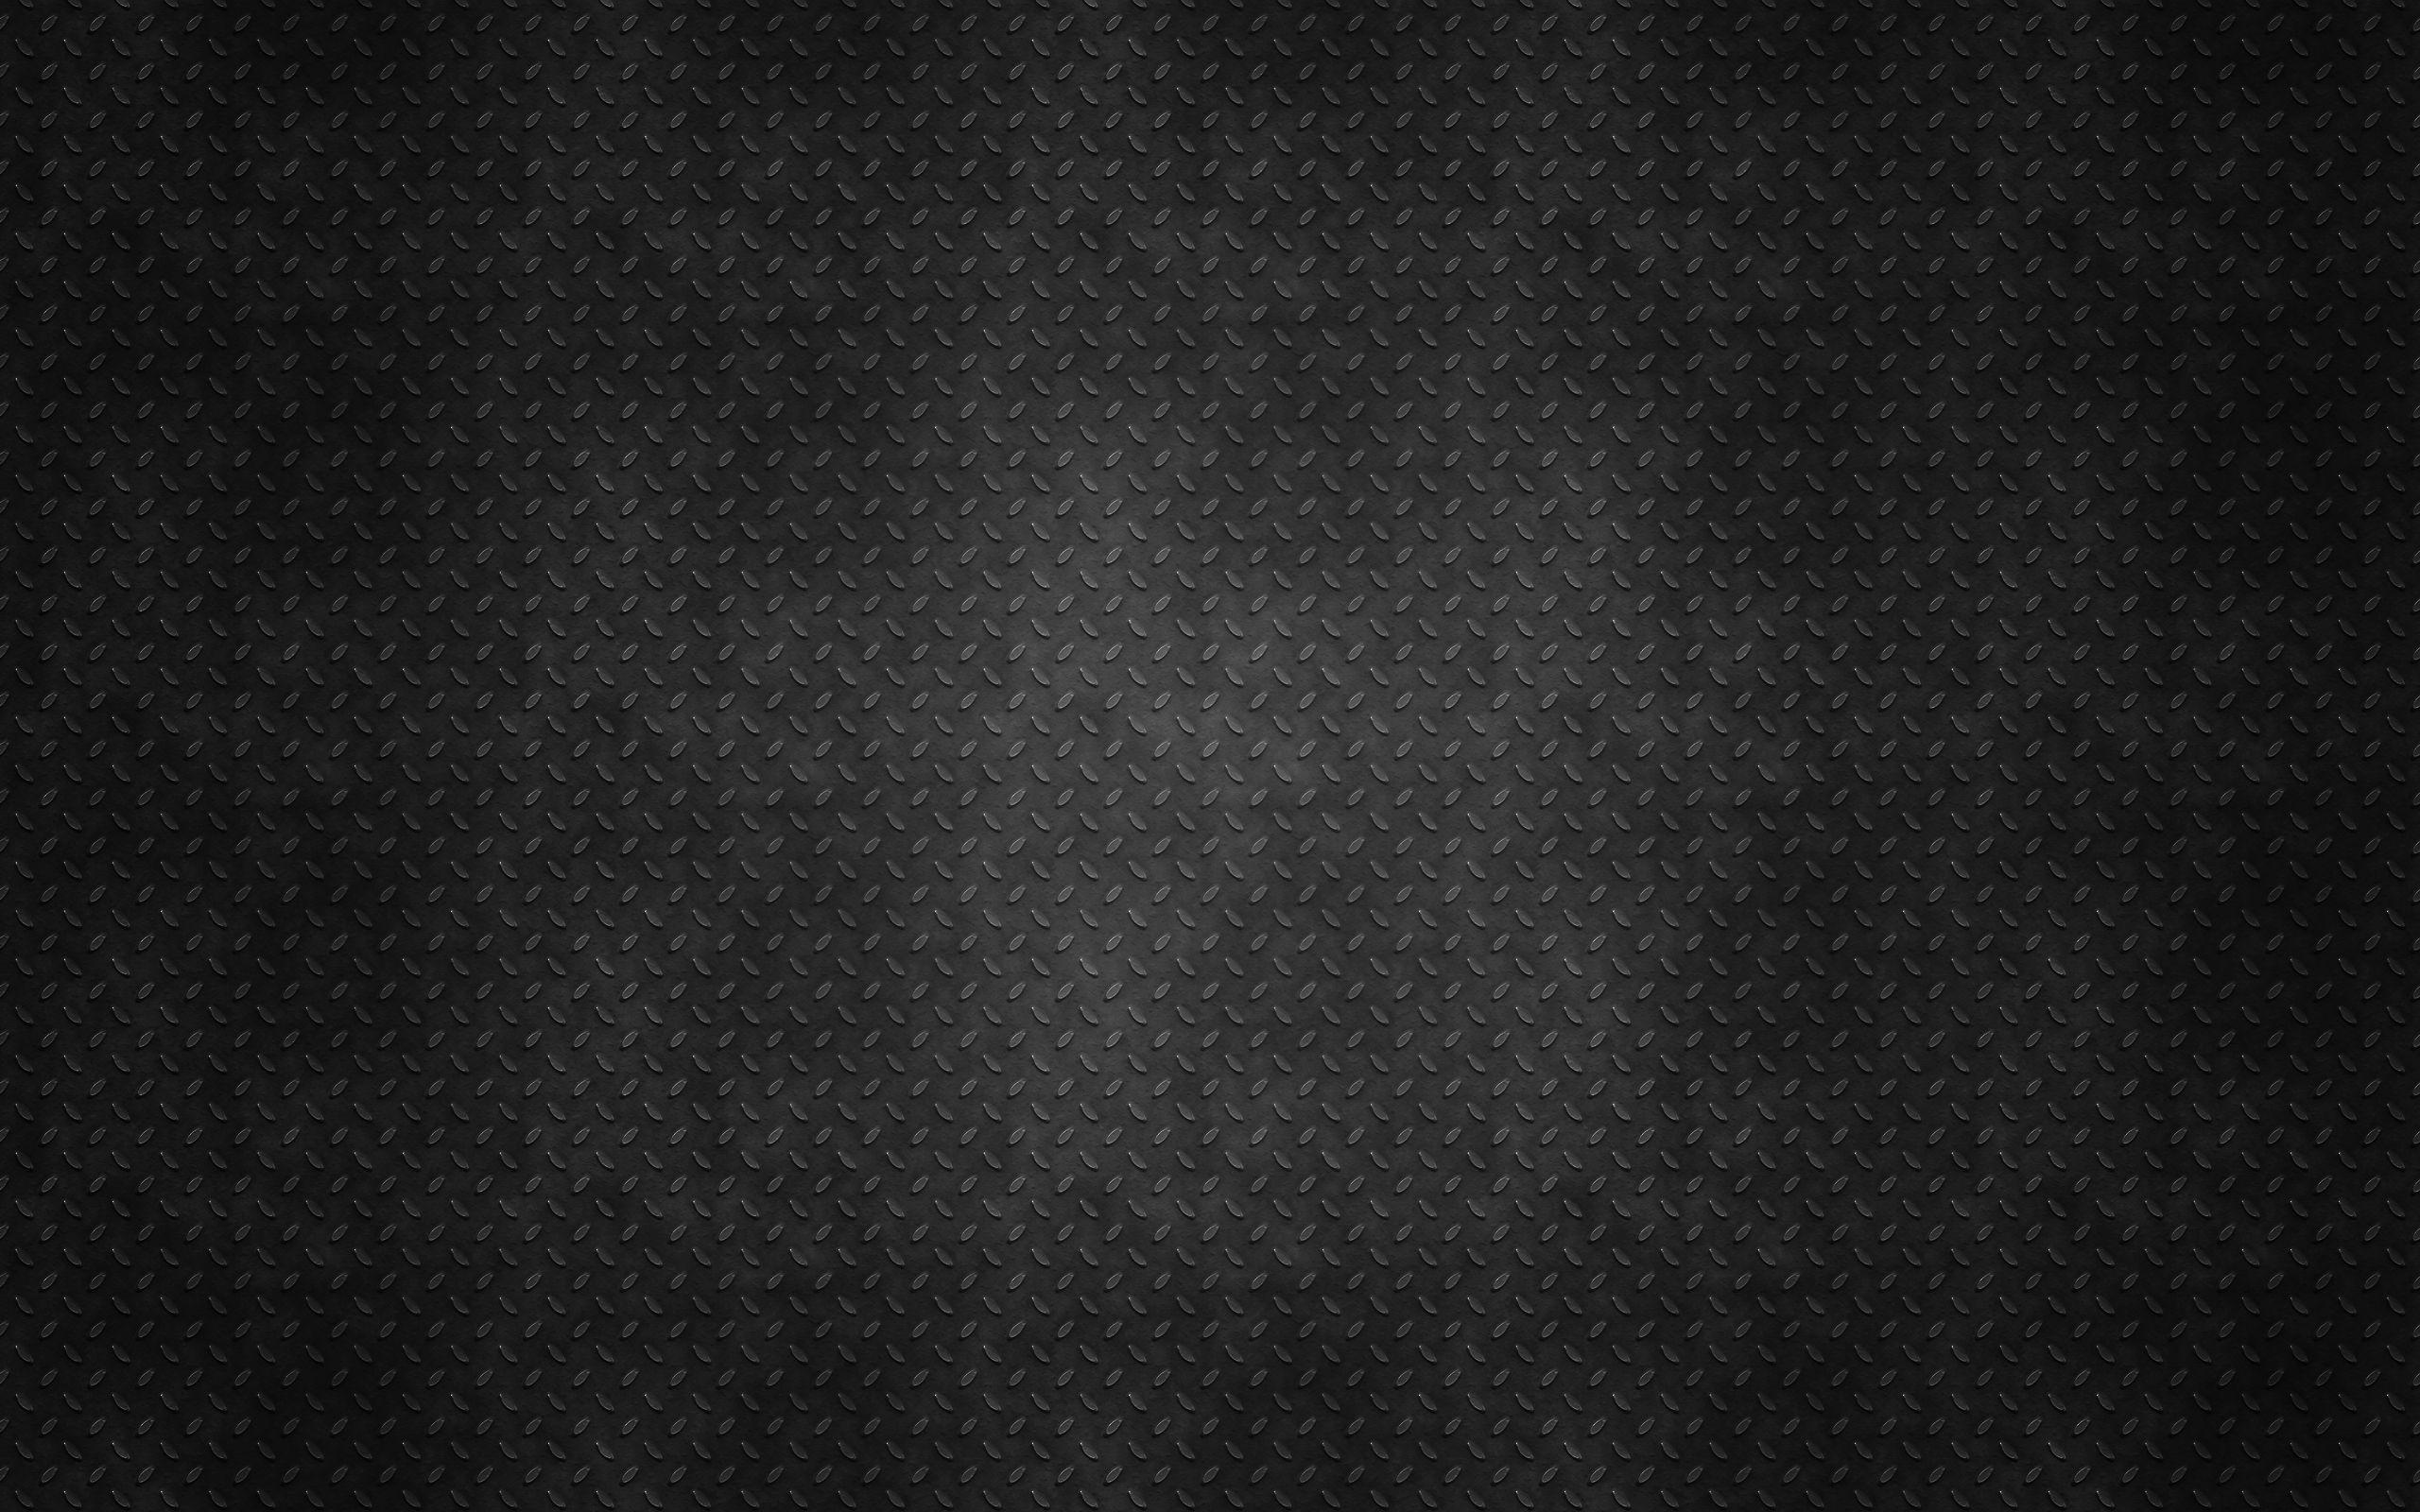 Black Textured Hd Background Wallpaper Jpg 2560 1600 Gambar Wallpaper Naruto Hitam